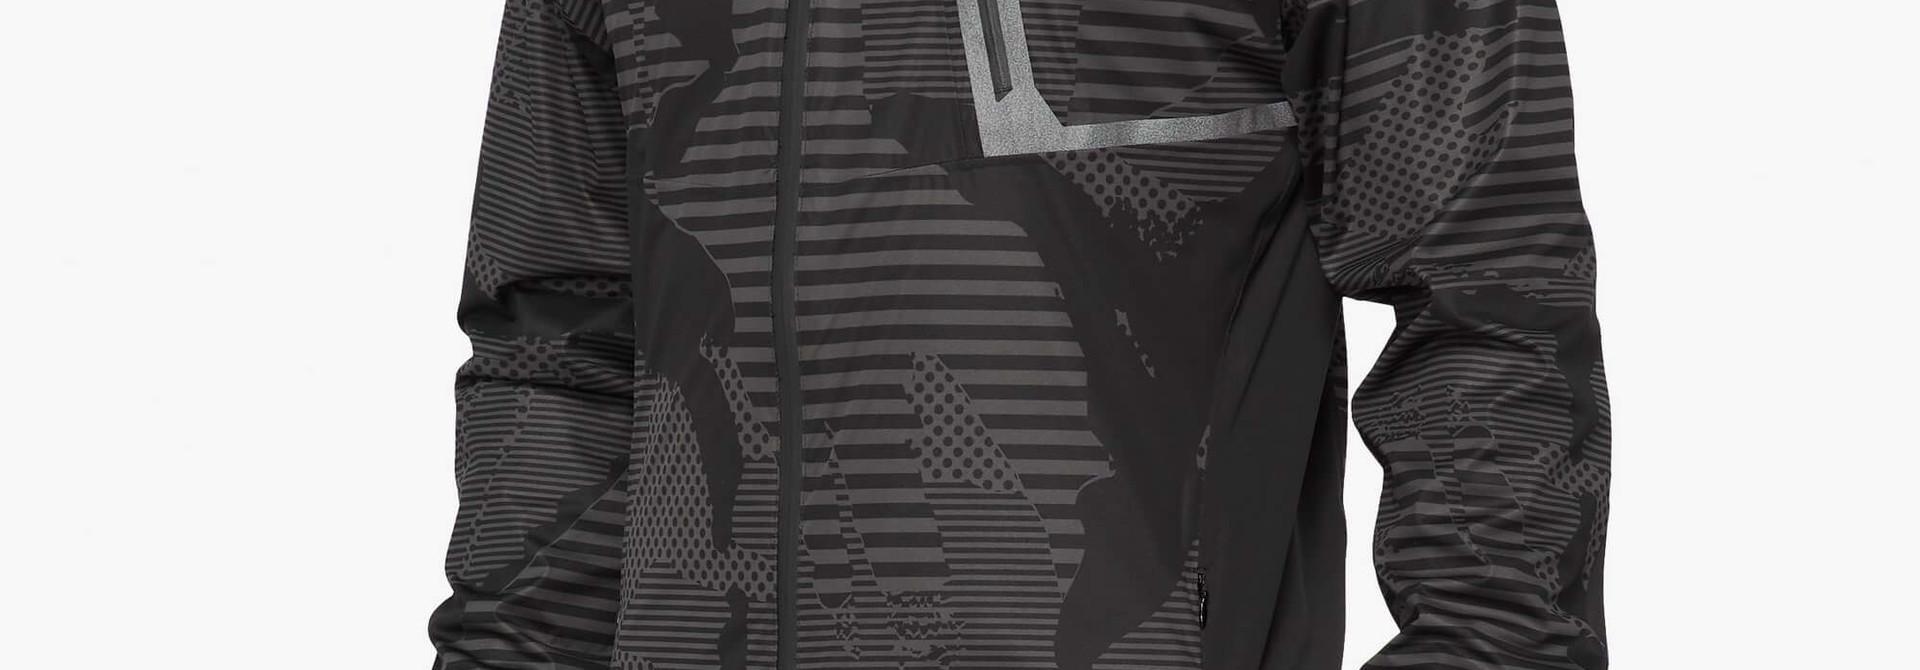 Hydromatic Jacket